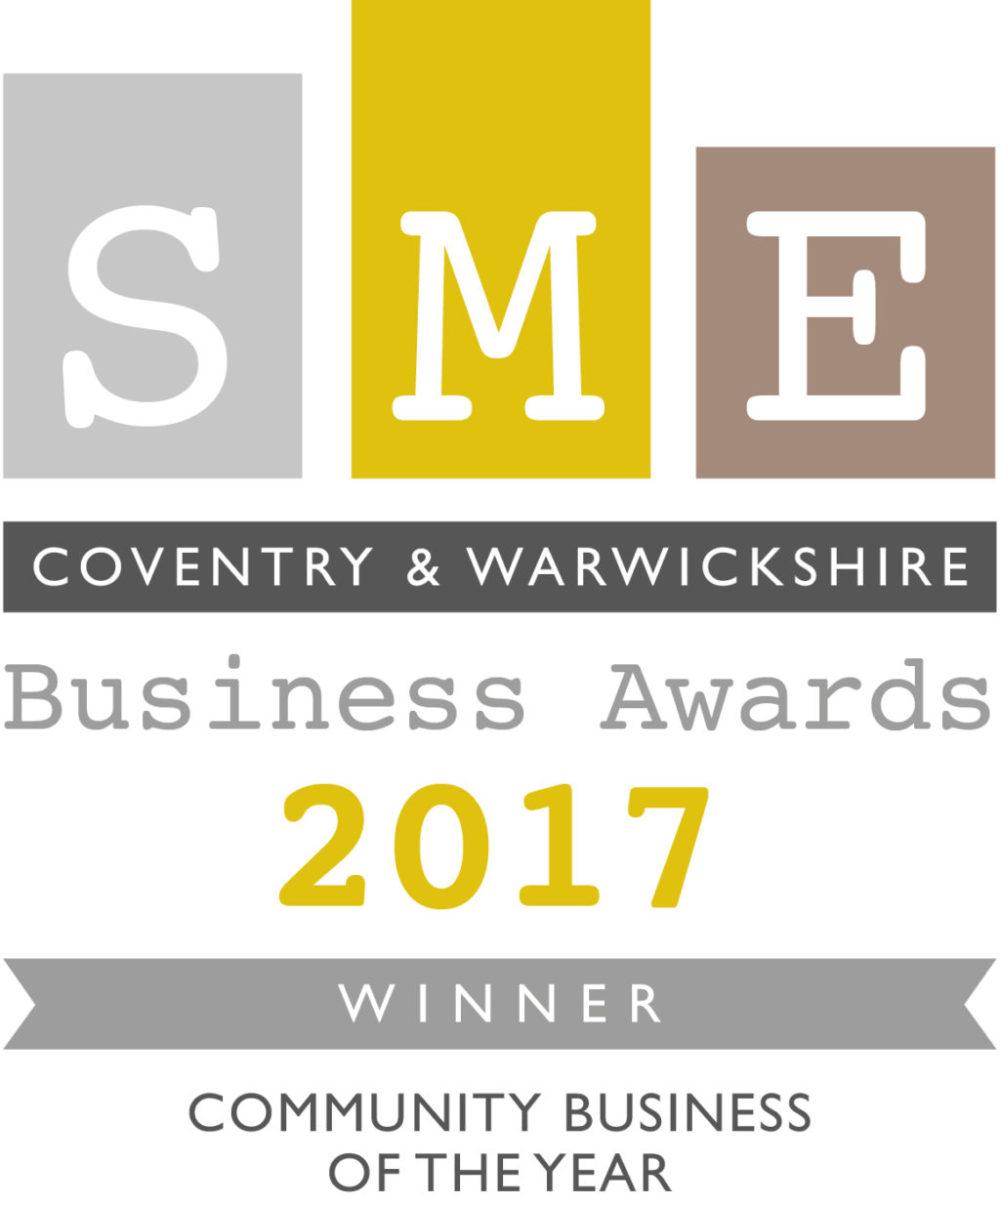 SME C&W Award Winner